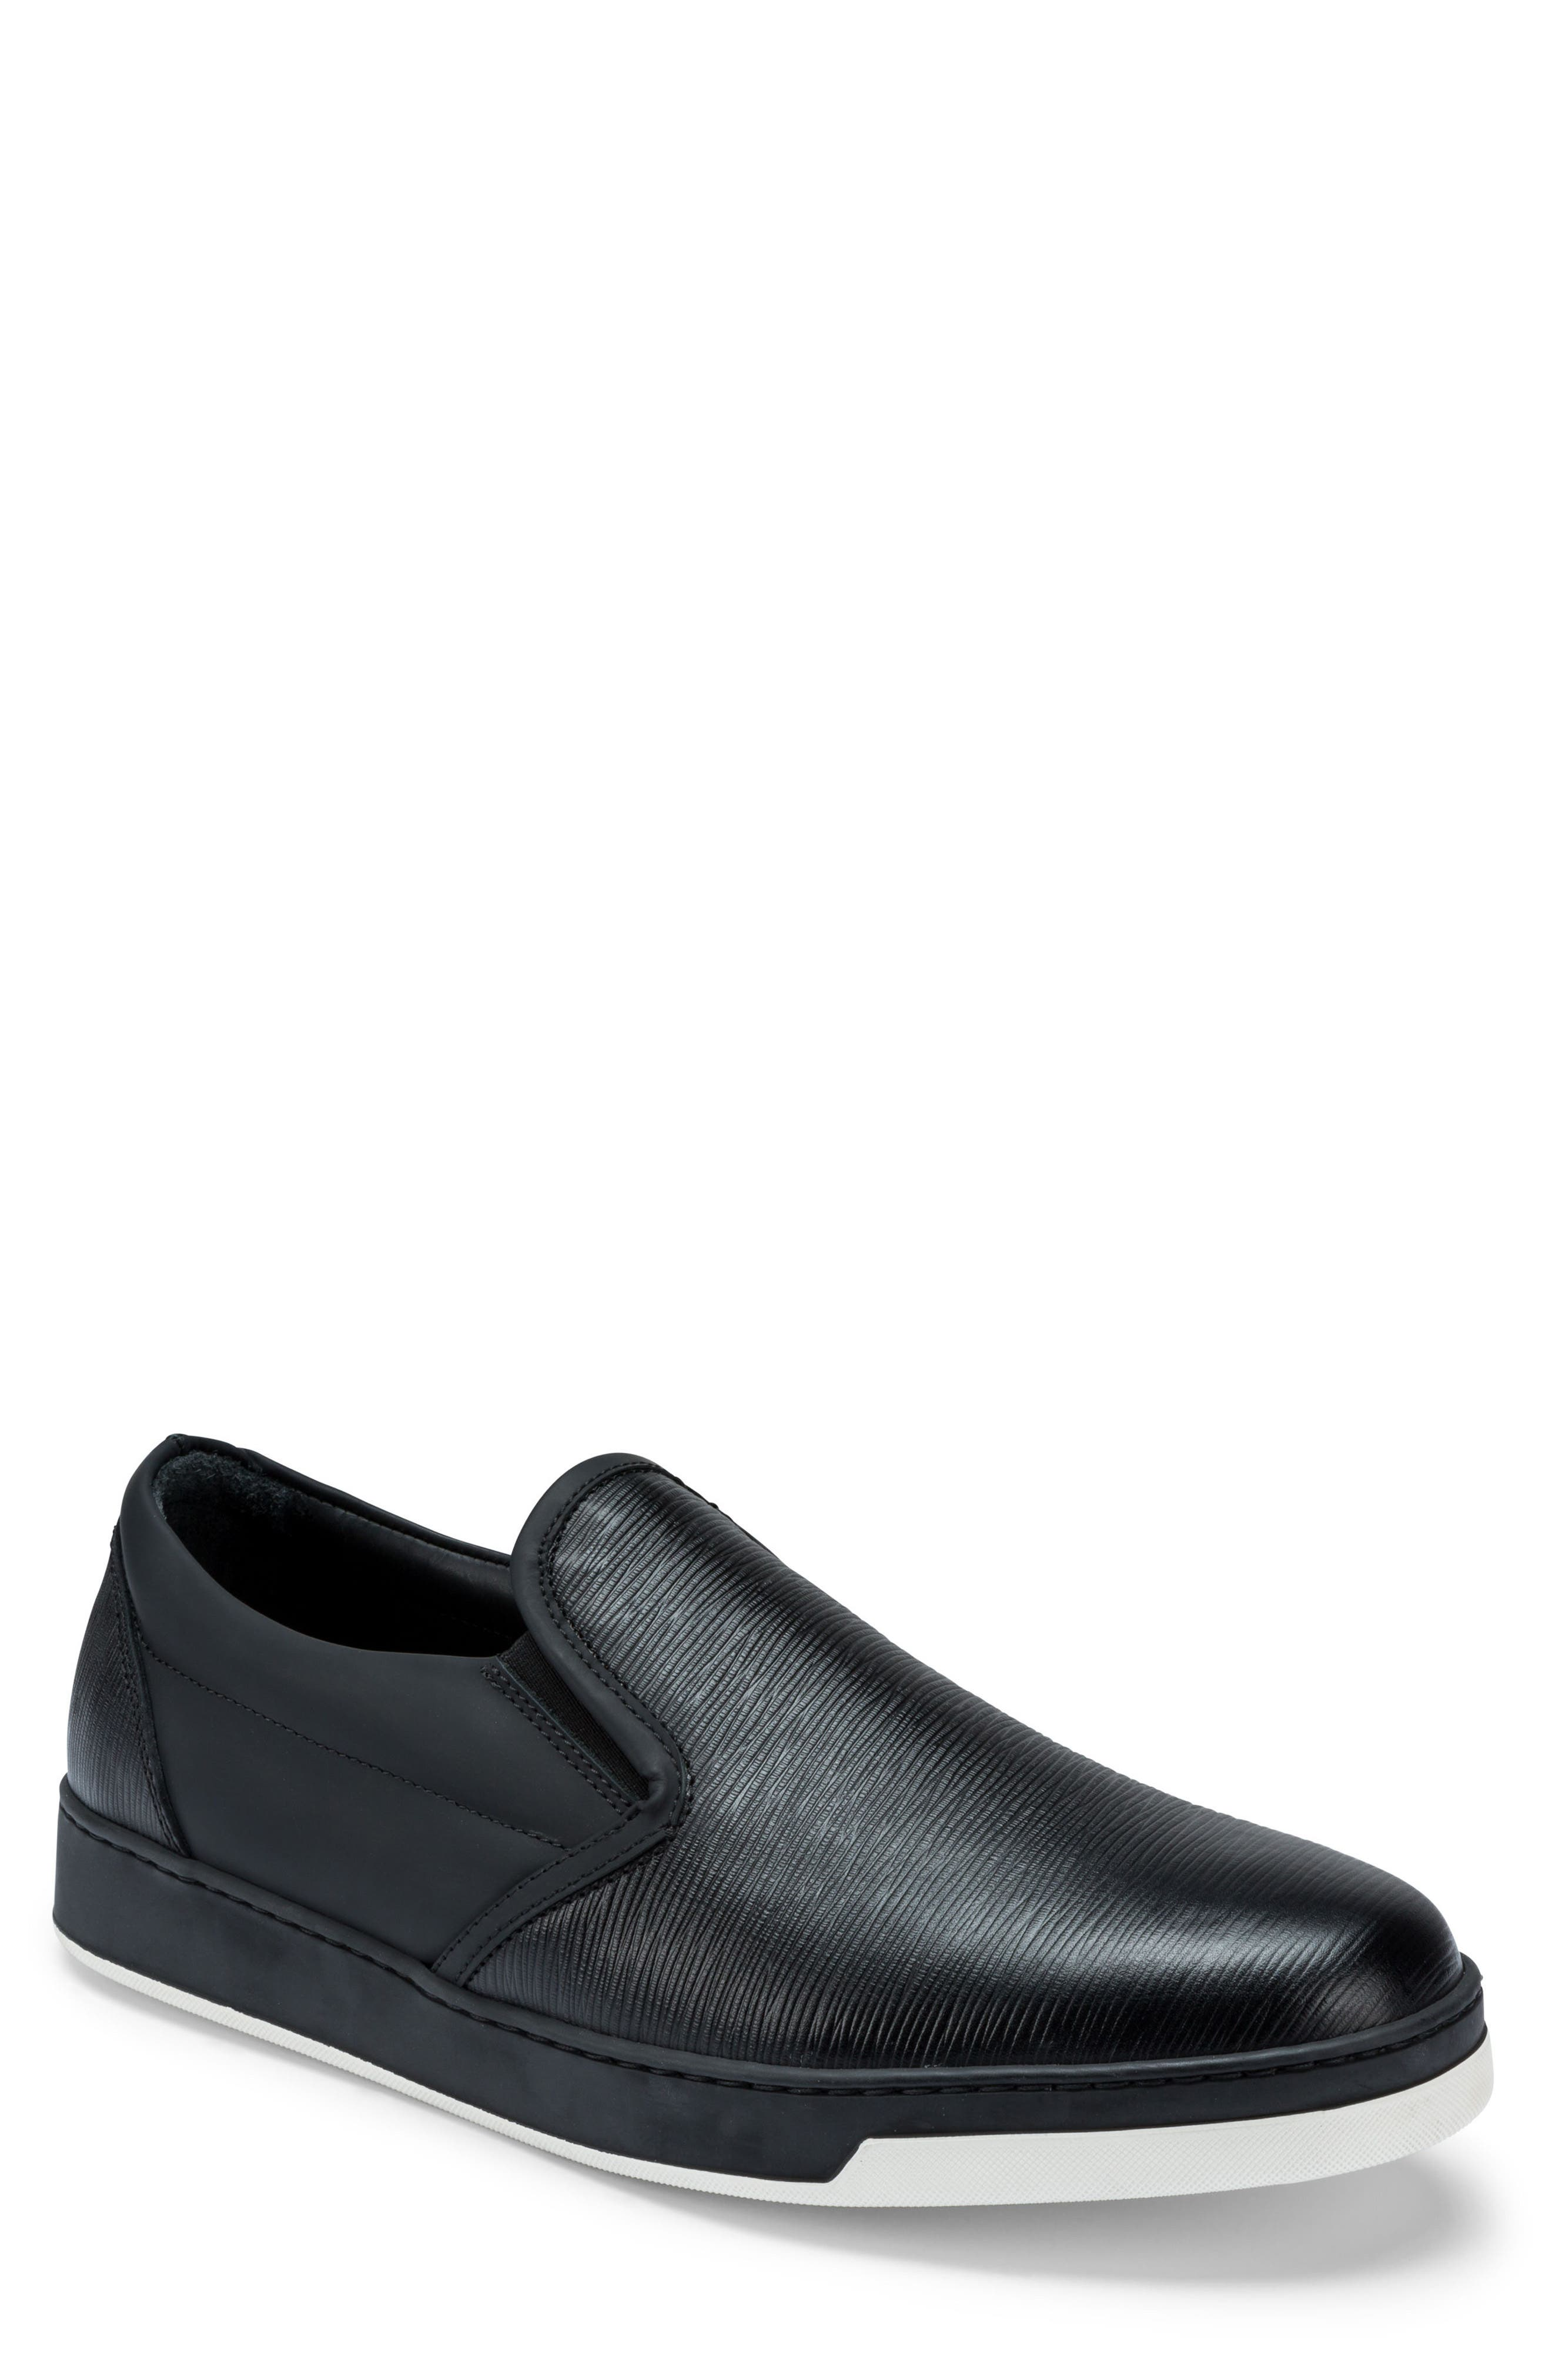 Santorini Slip-On Sneaker,                         Main,                         color, 001